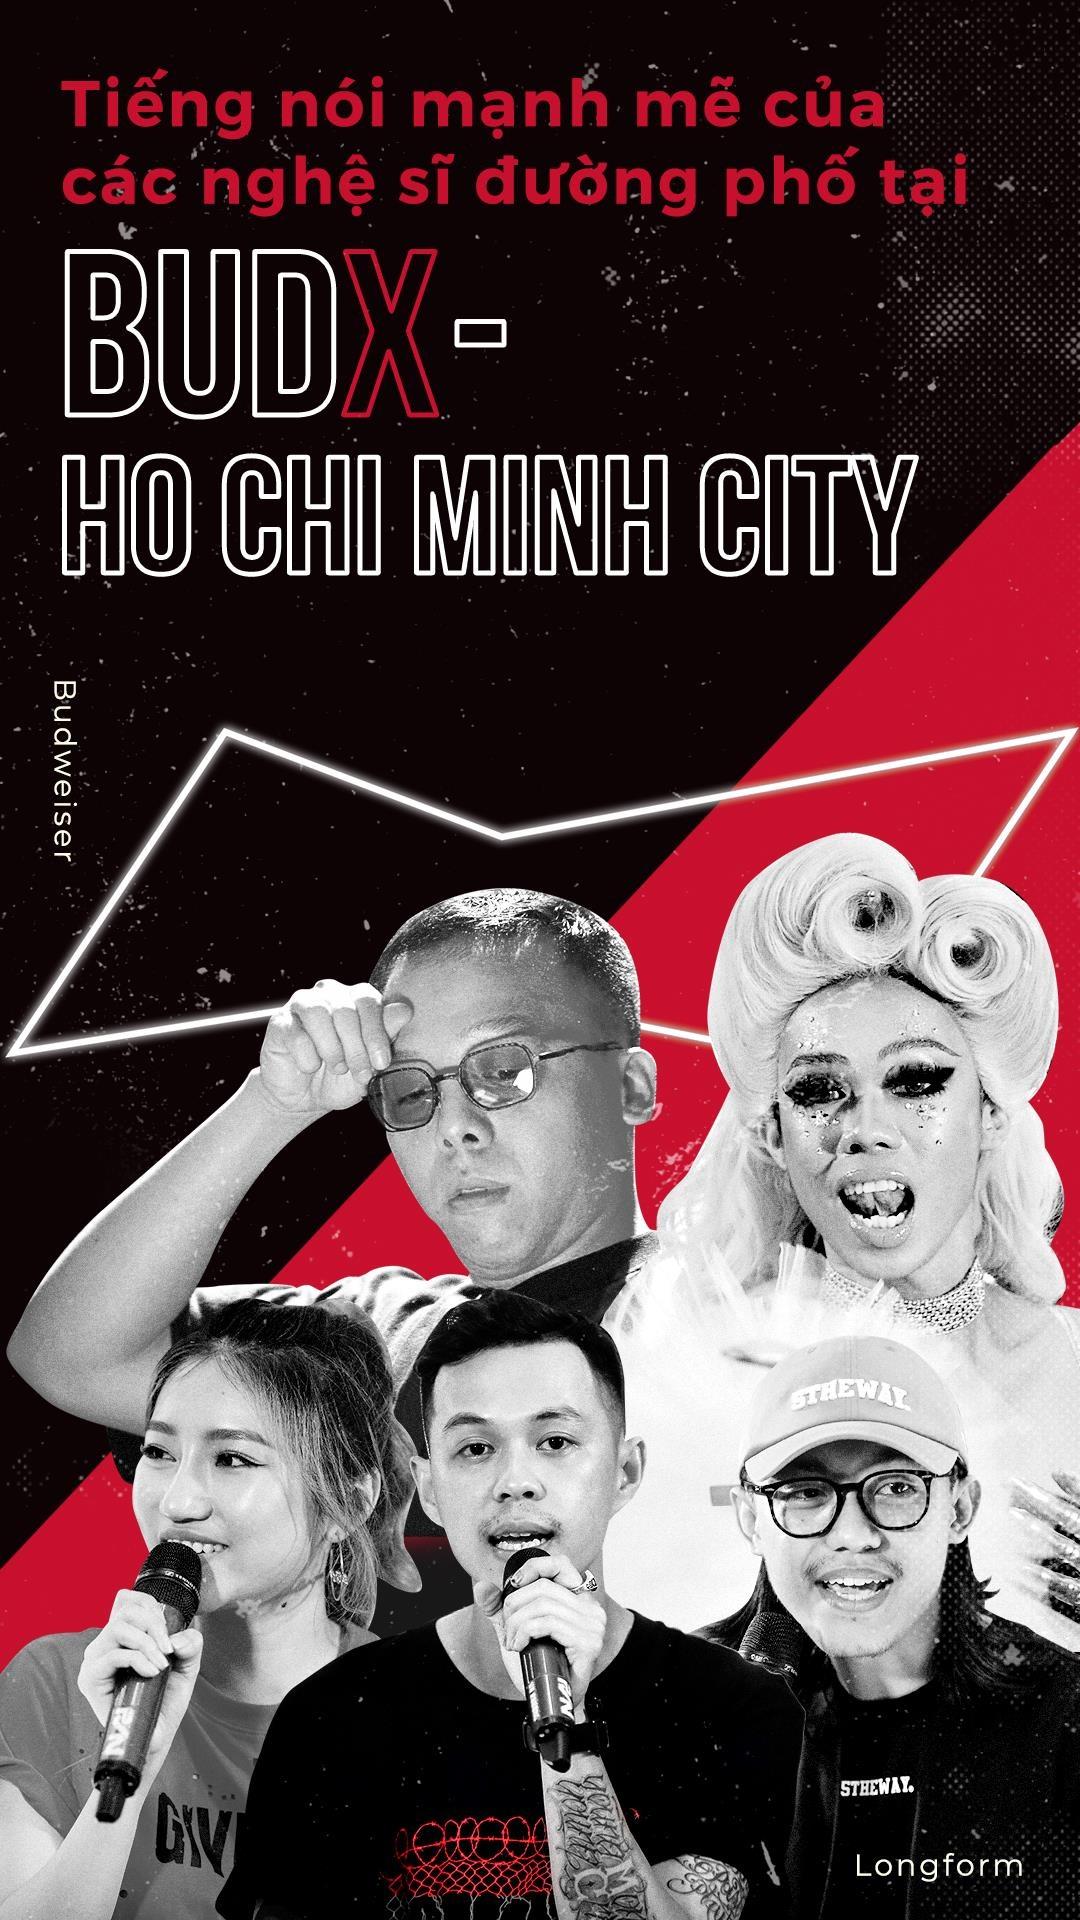 Tieng noi manh me cua cac nghe si duong pho tai Budx Ho Chi Minh City hinh anh 1